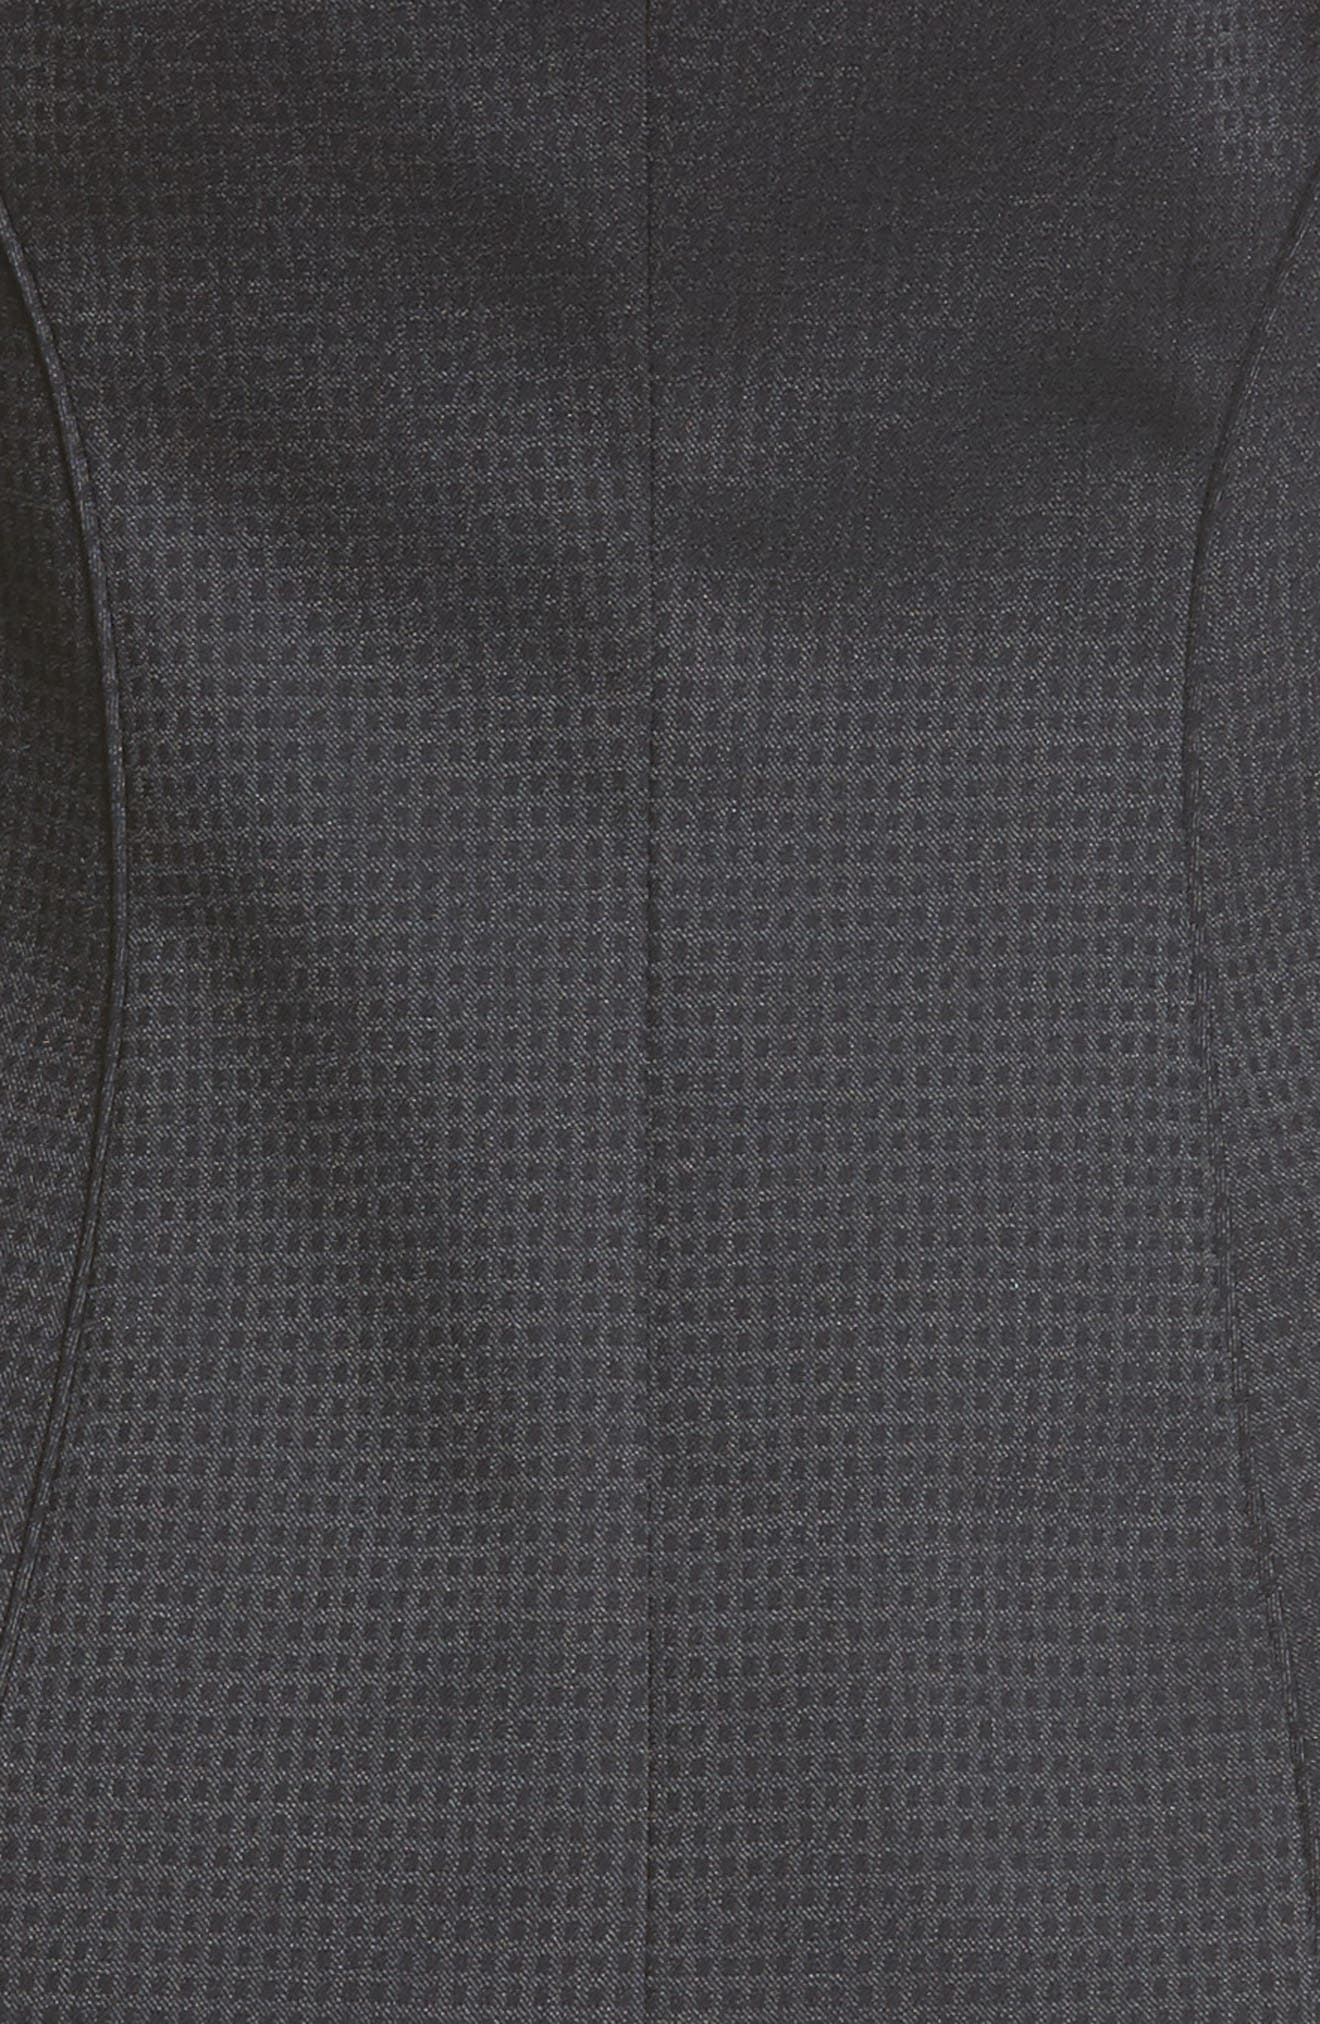 Jukani Check Wool Blend Suit Jacket,                             Alternate thumbnail 12, color,